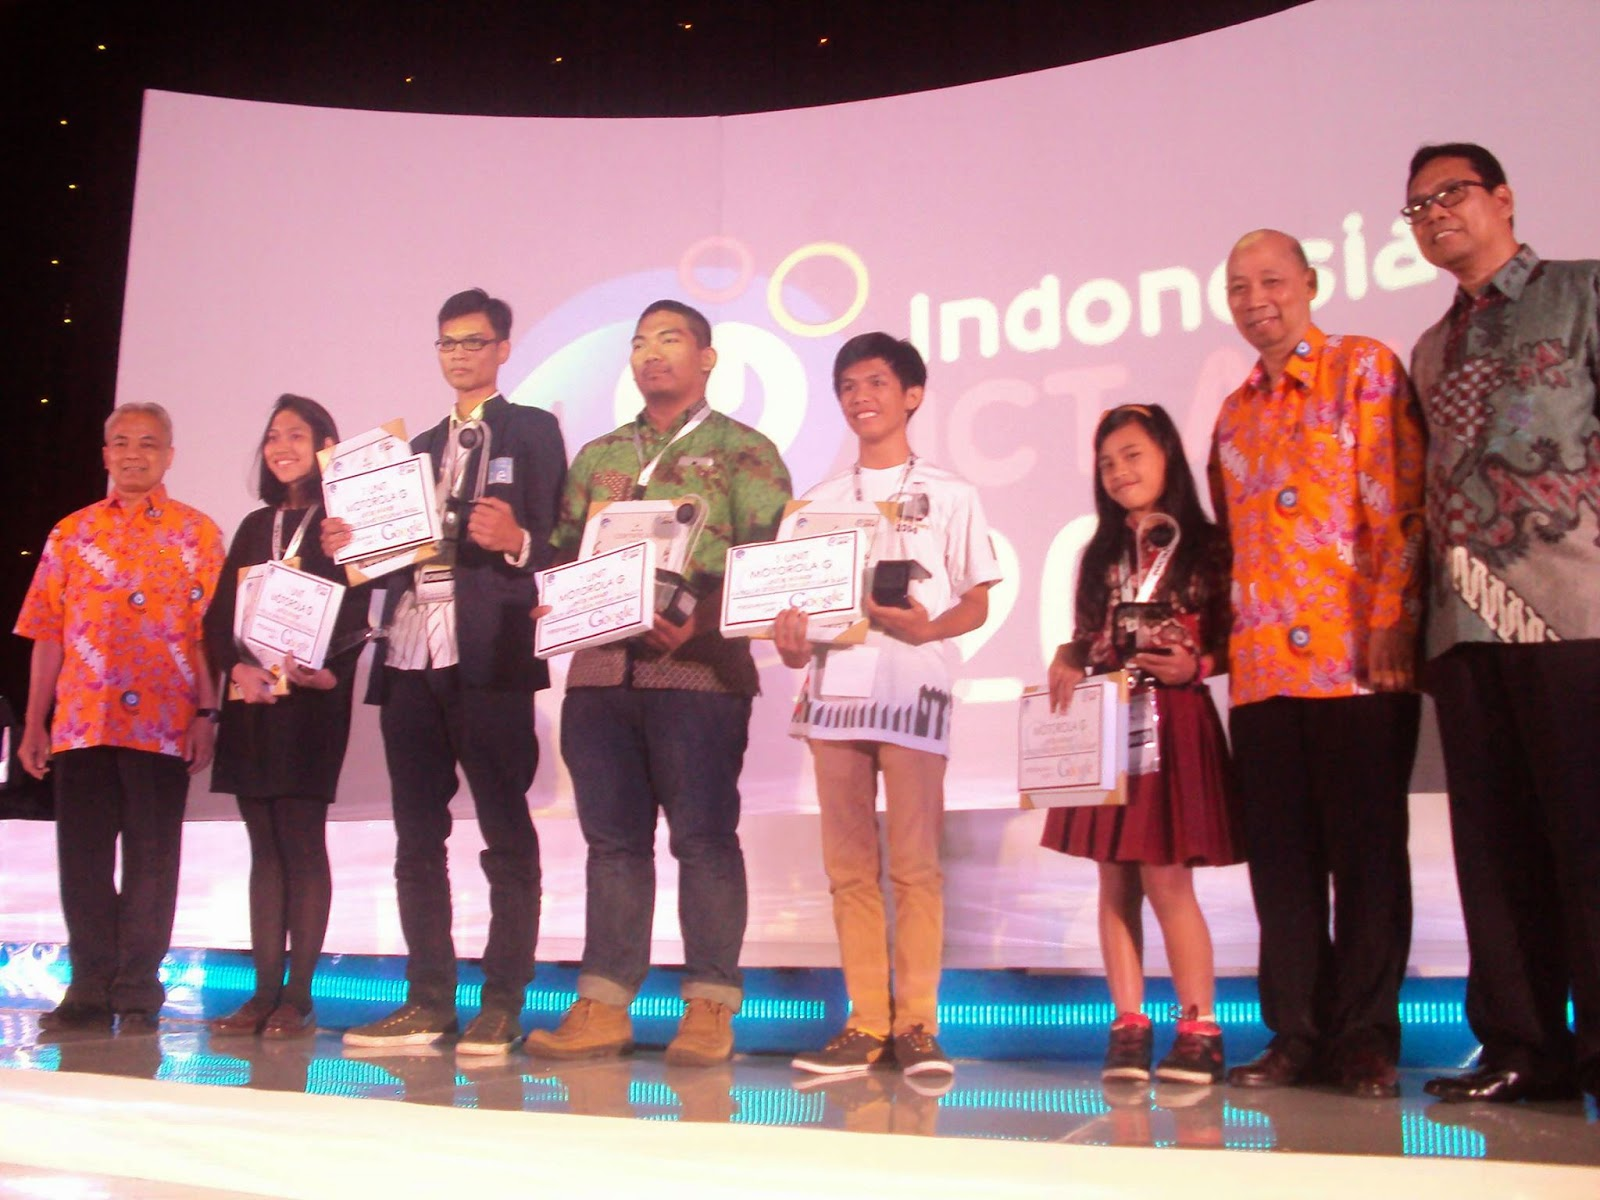 Komunitas Raspberry Pi Garut Juara Nasional INAICTA 2014 Pusat